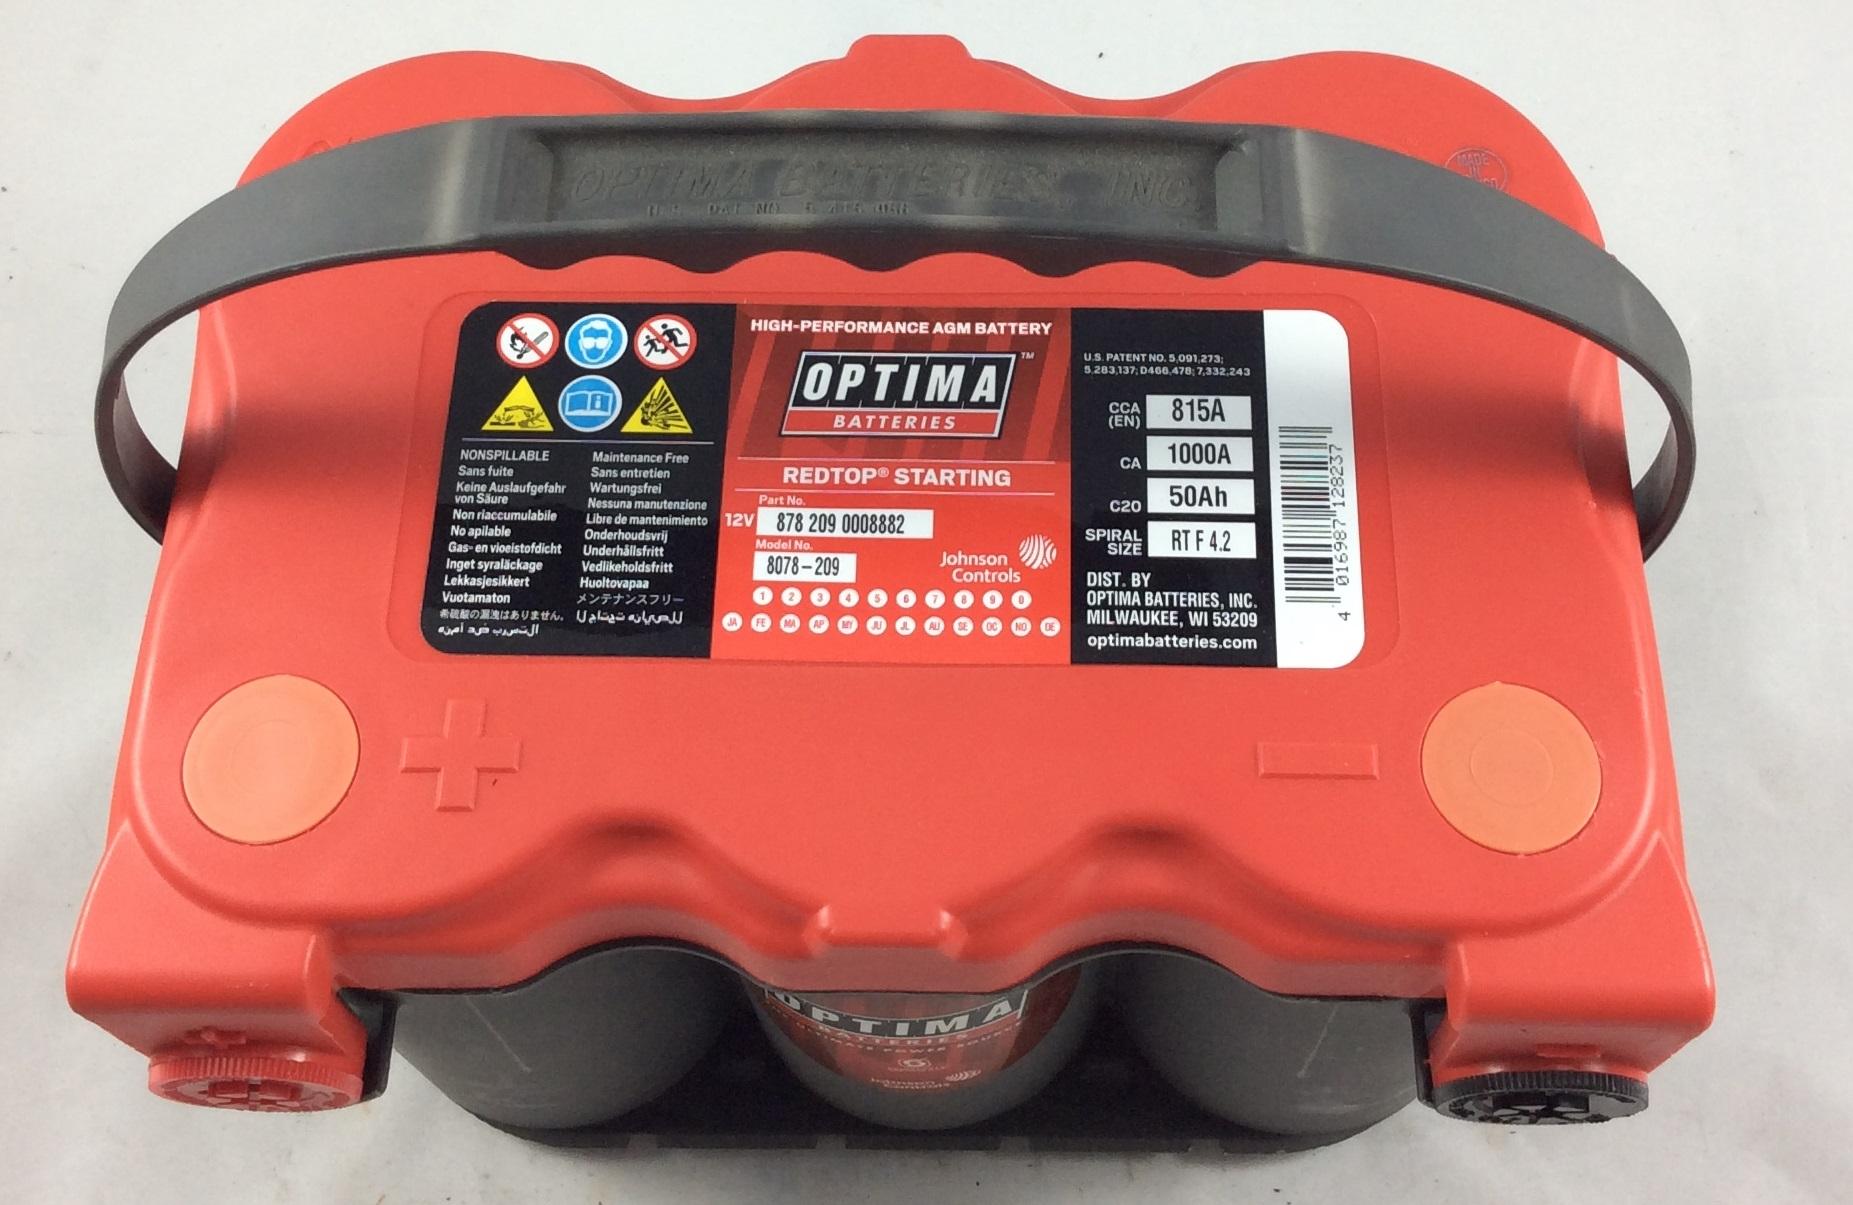 BATTERIA OPTIMA 12V 50AH 815A(EN) RTF 4.2